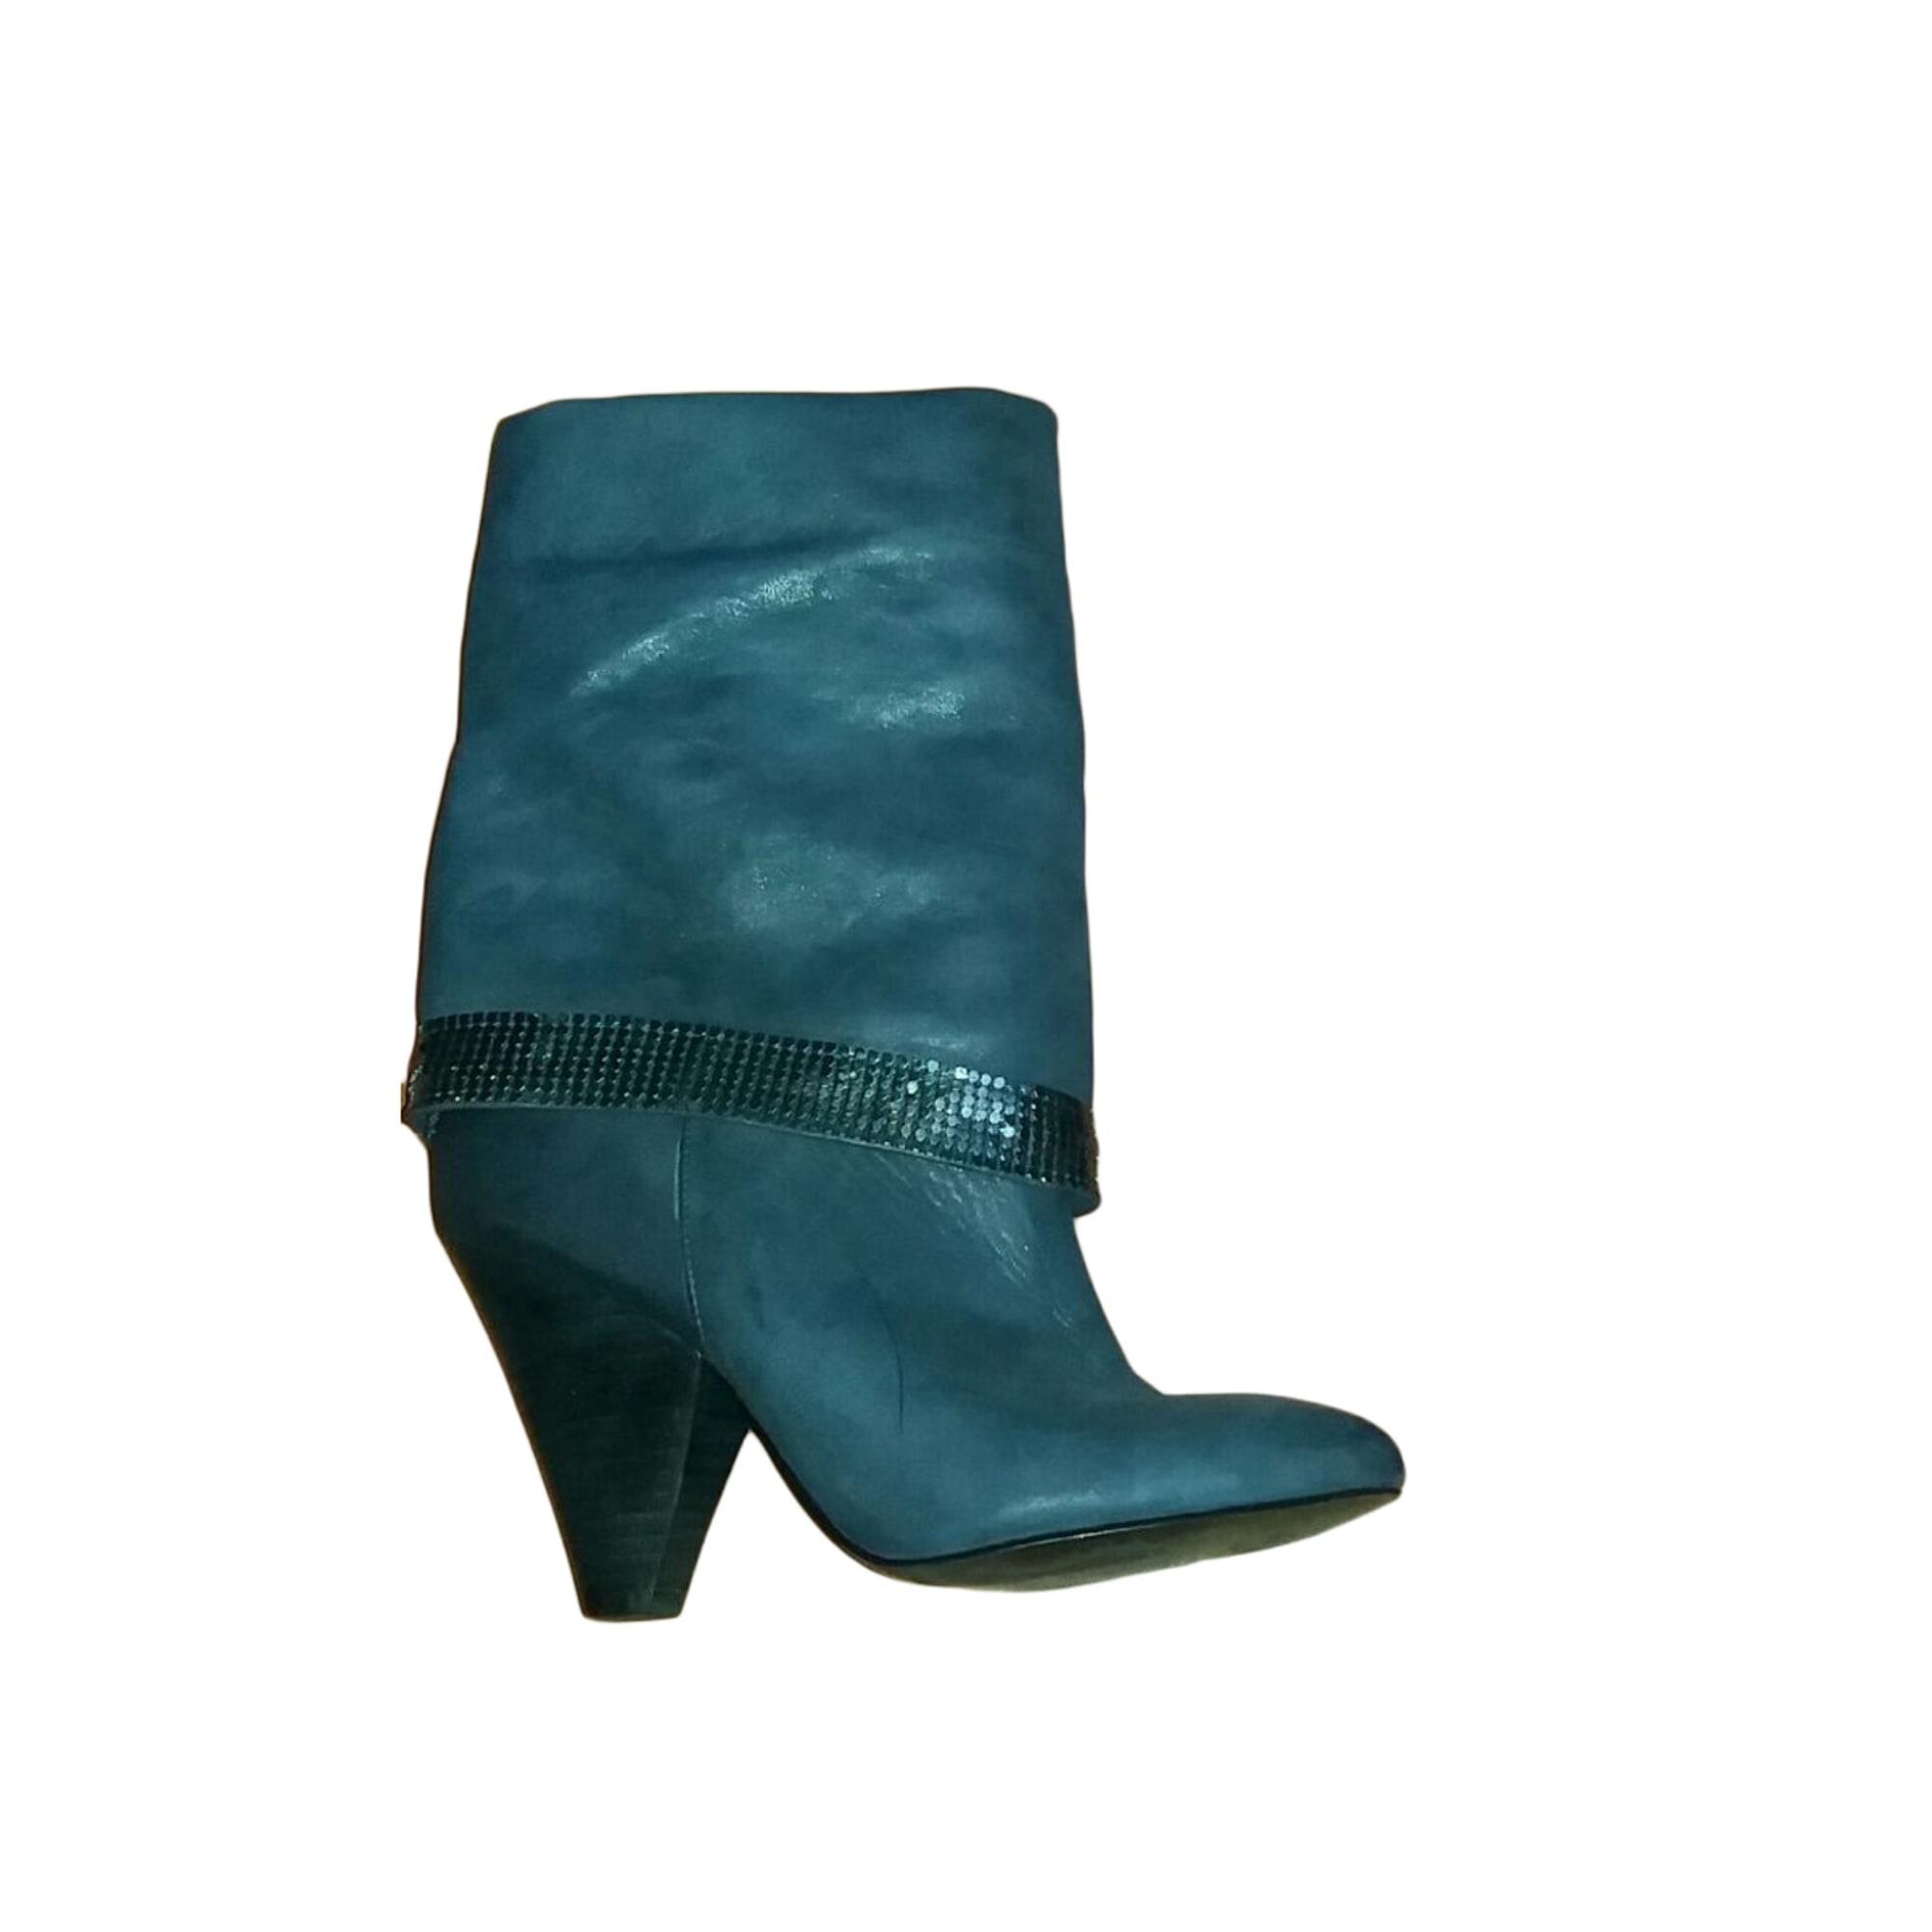 Bottes à talons GUESS Bleu, bleu marine, bleu turquoise